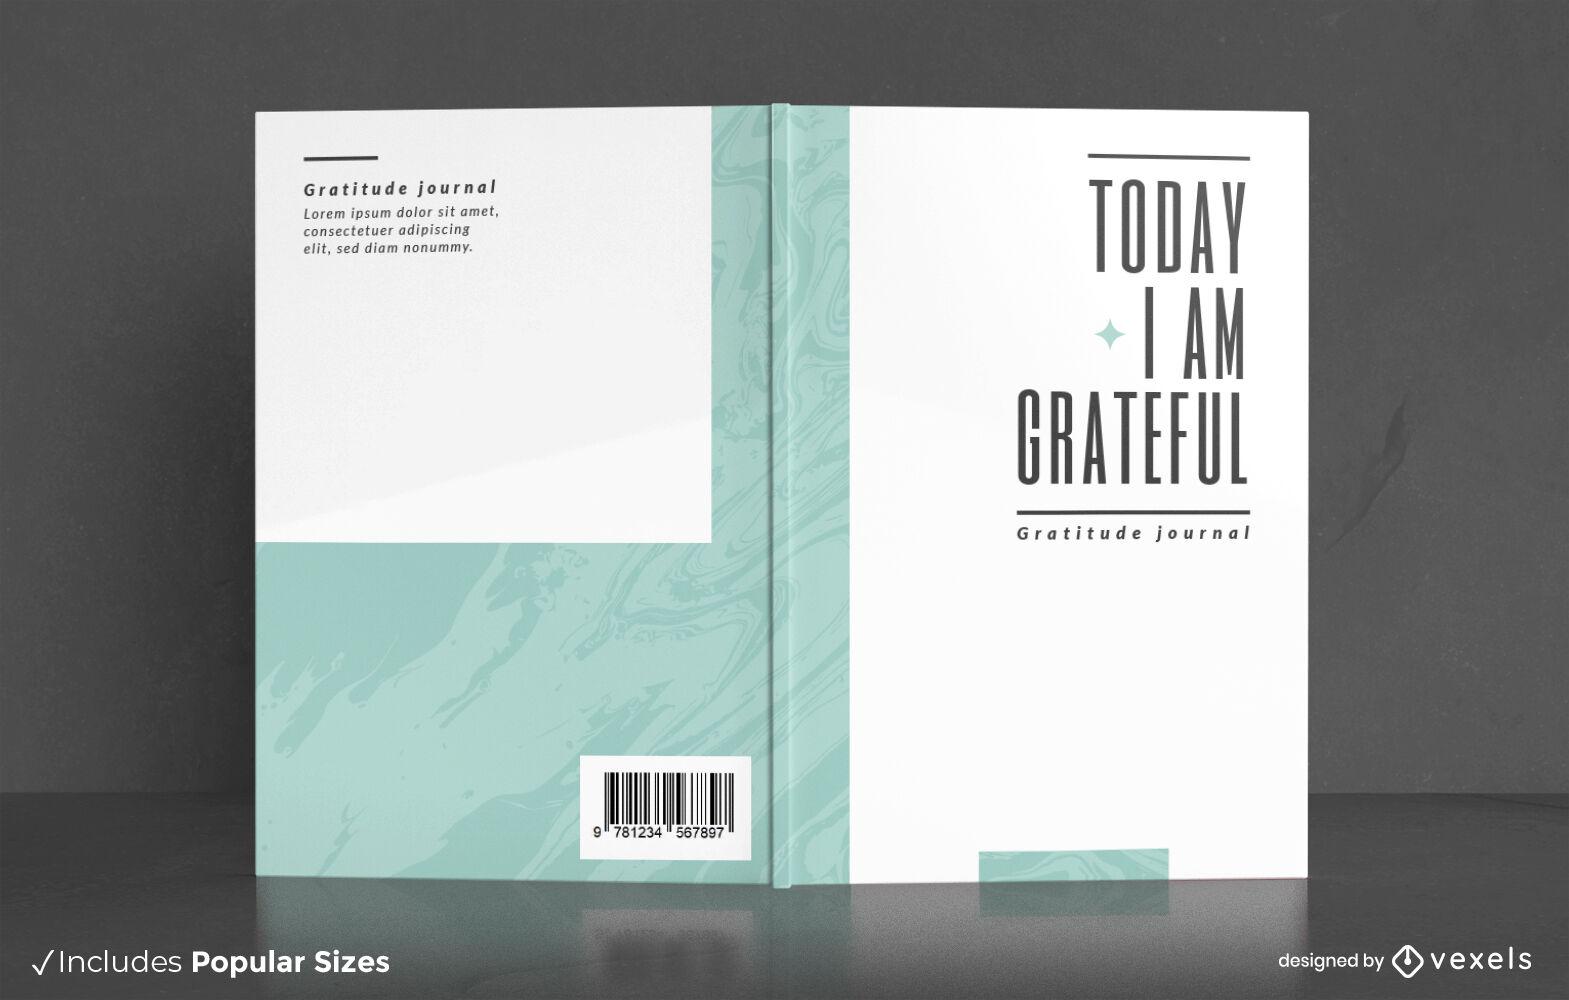 Grateful journal minimalist book cover design